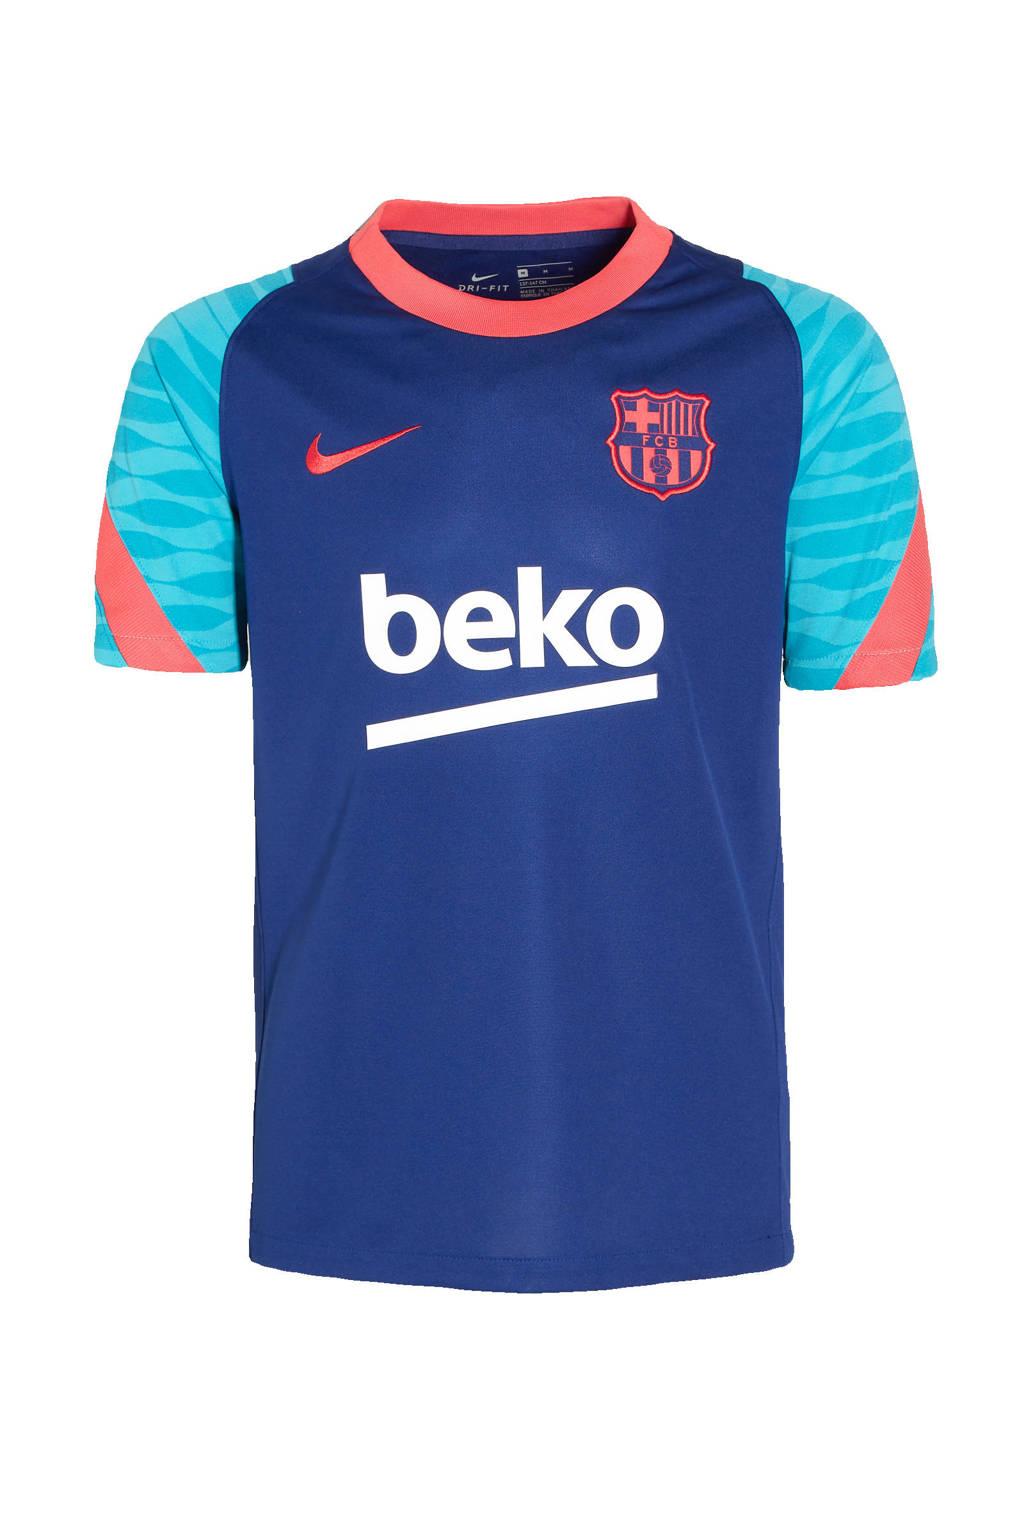 Nike Junior  voetbalshirt kobaltblauw/rood, Kobaltblauw/rood